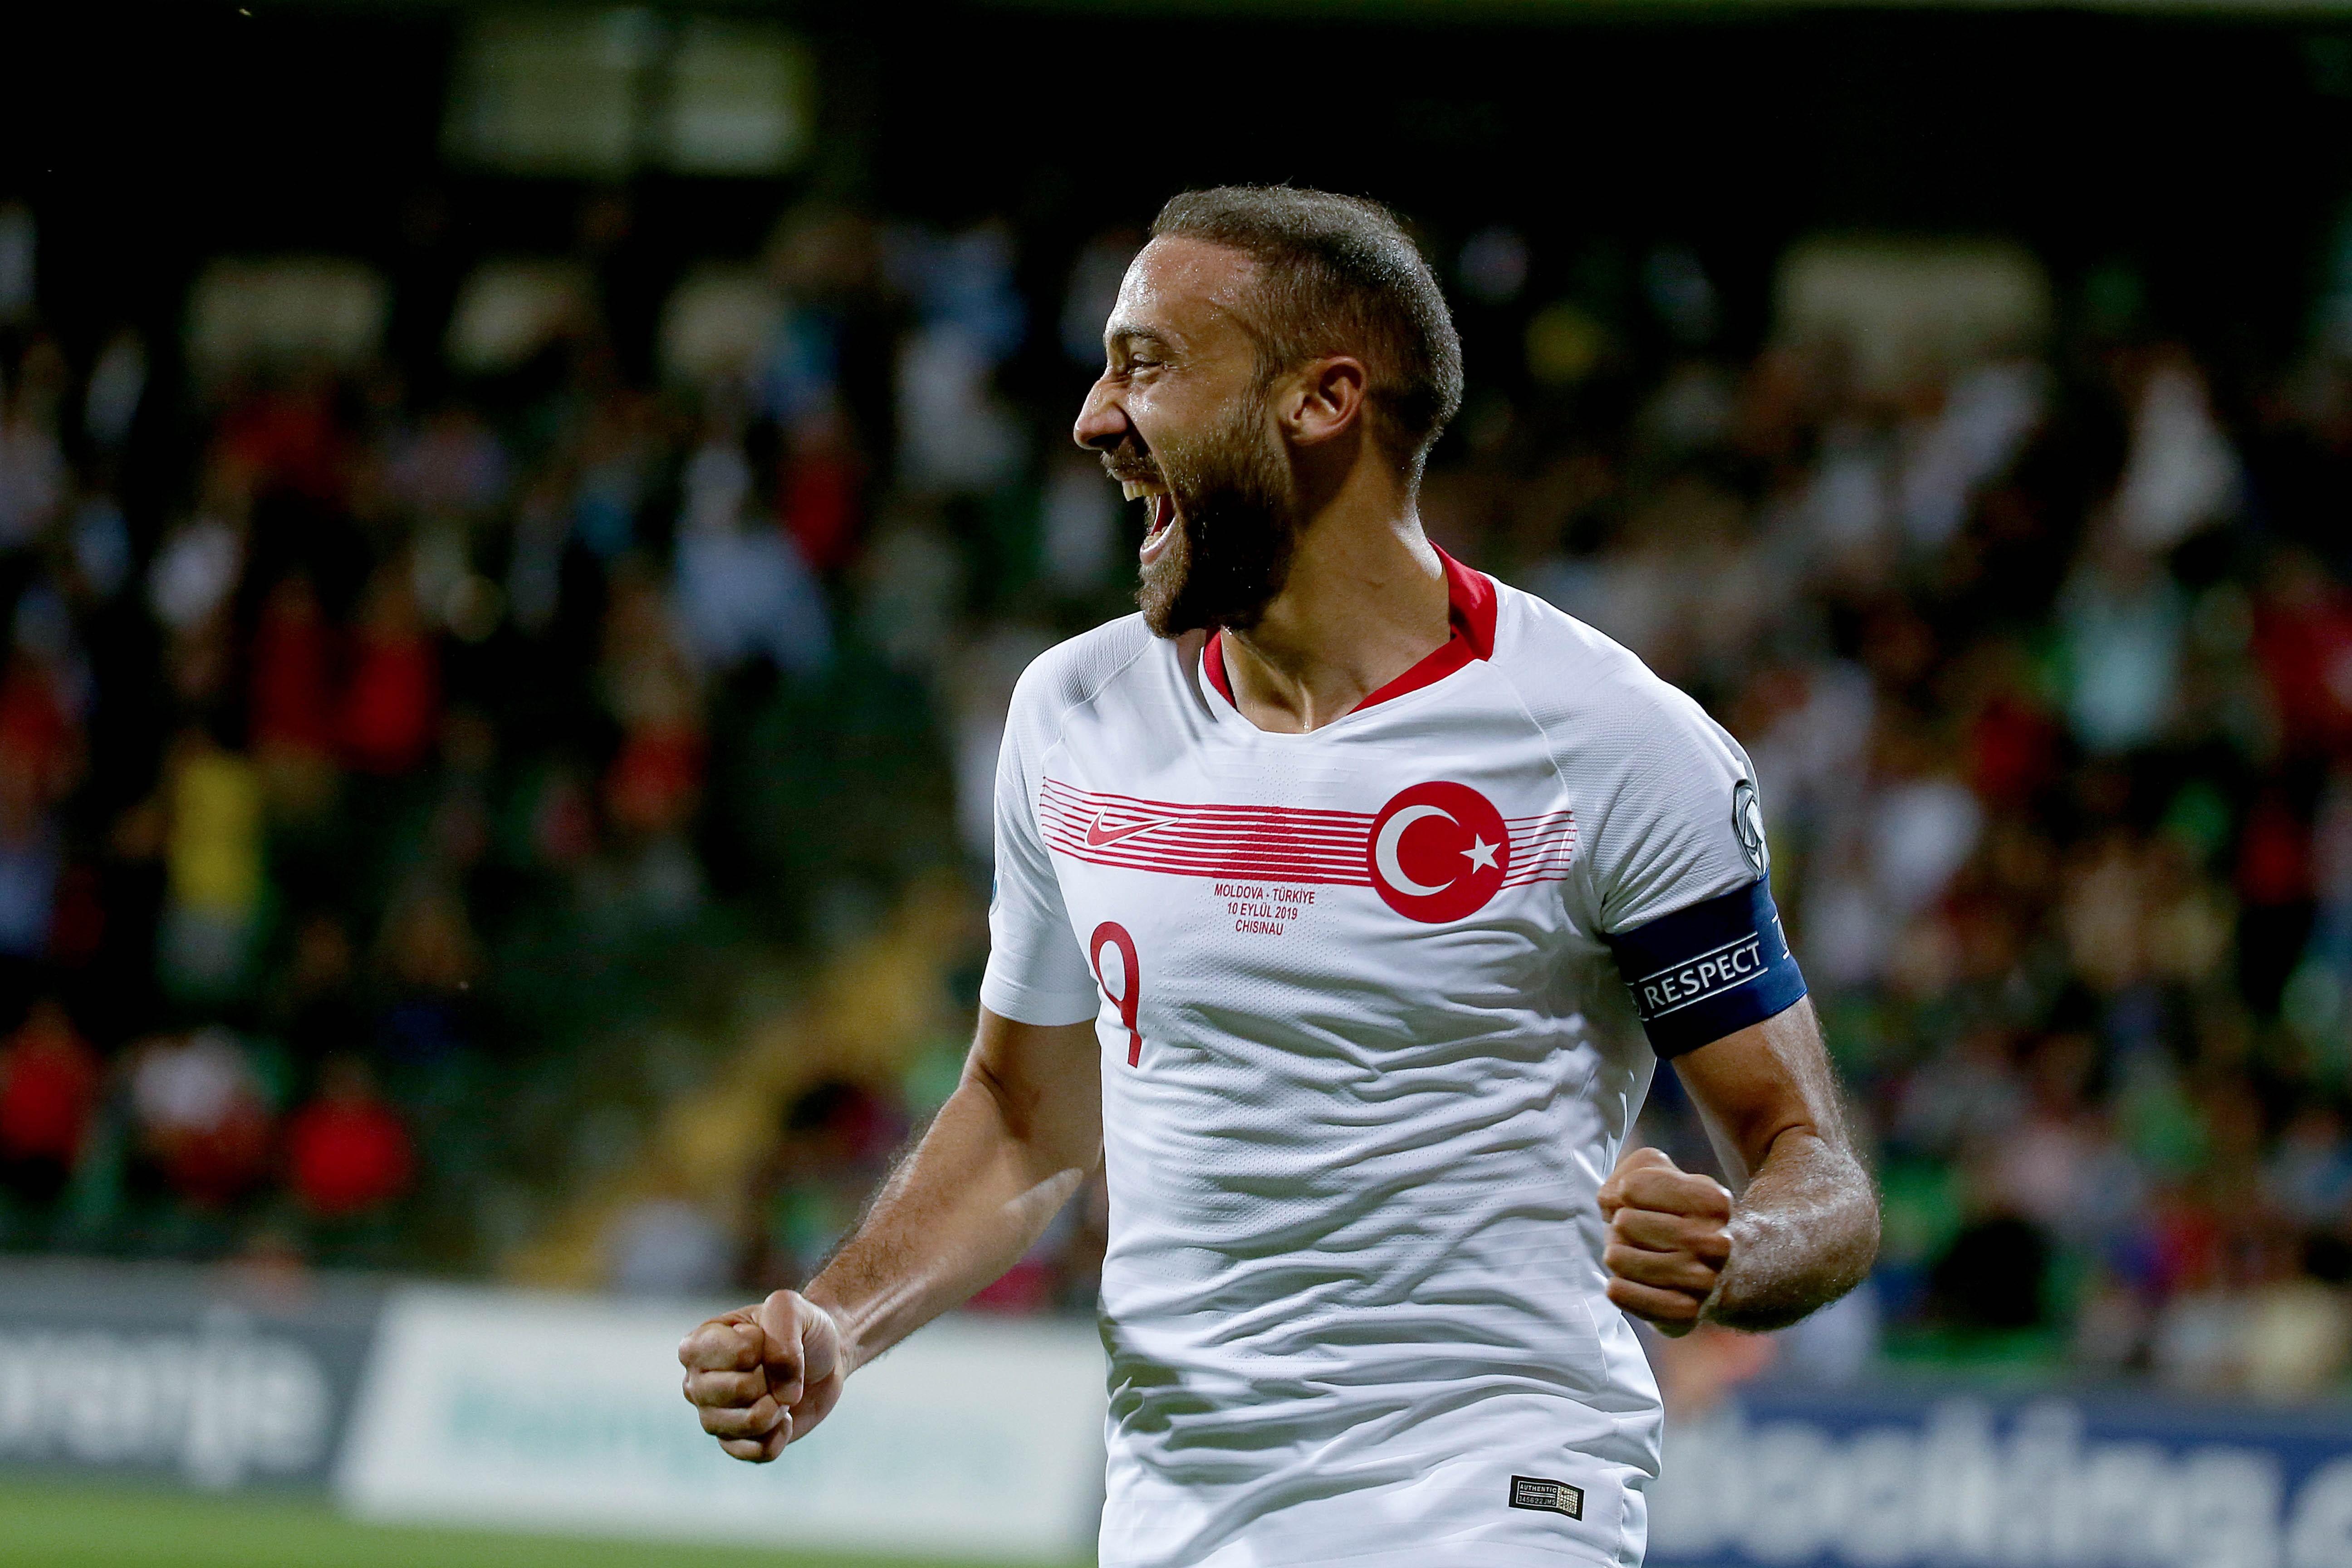 Moldova vs Turkey EURO Qualifiers 2019/20 Qualifying round match